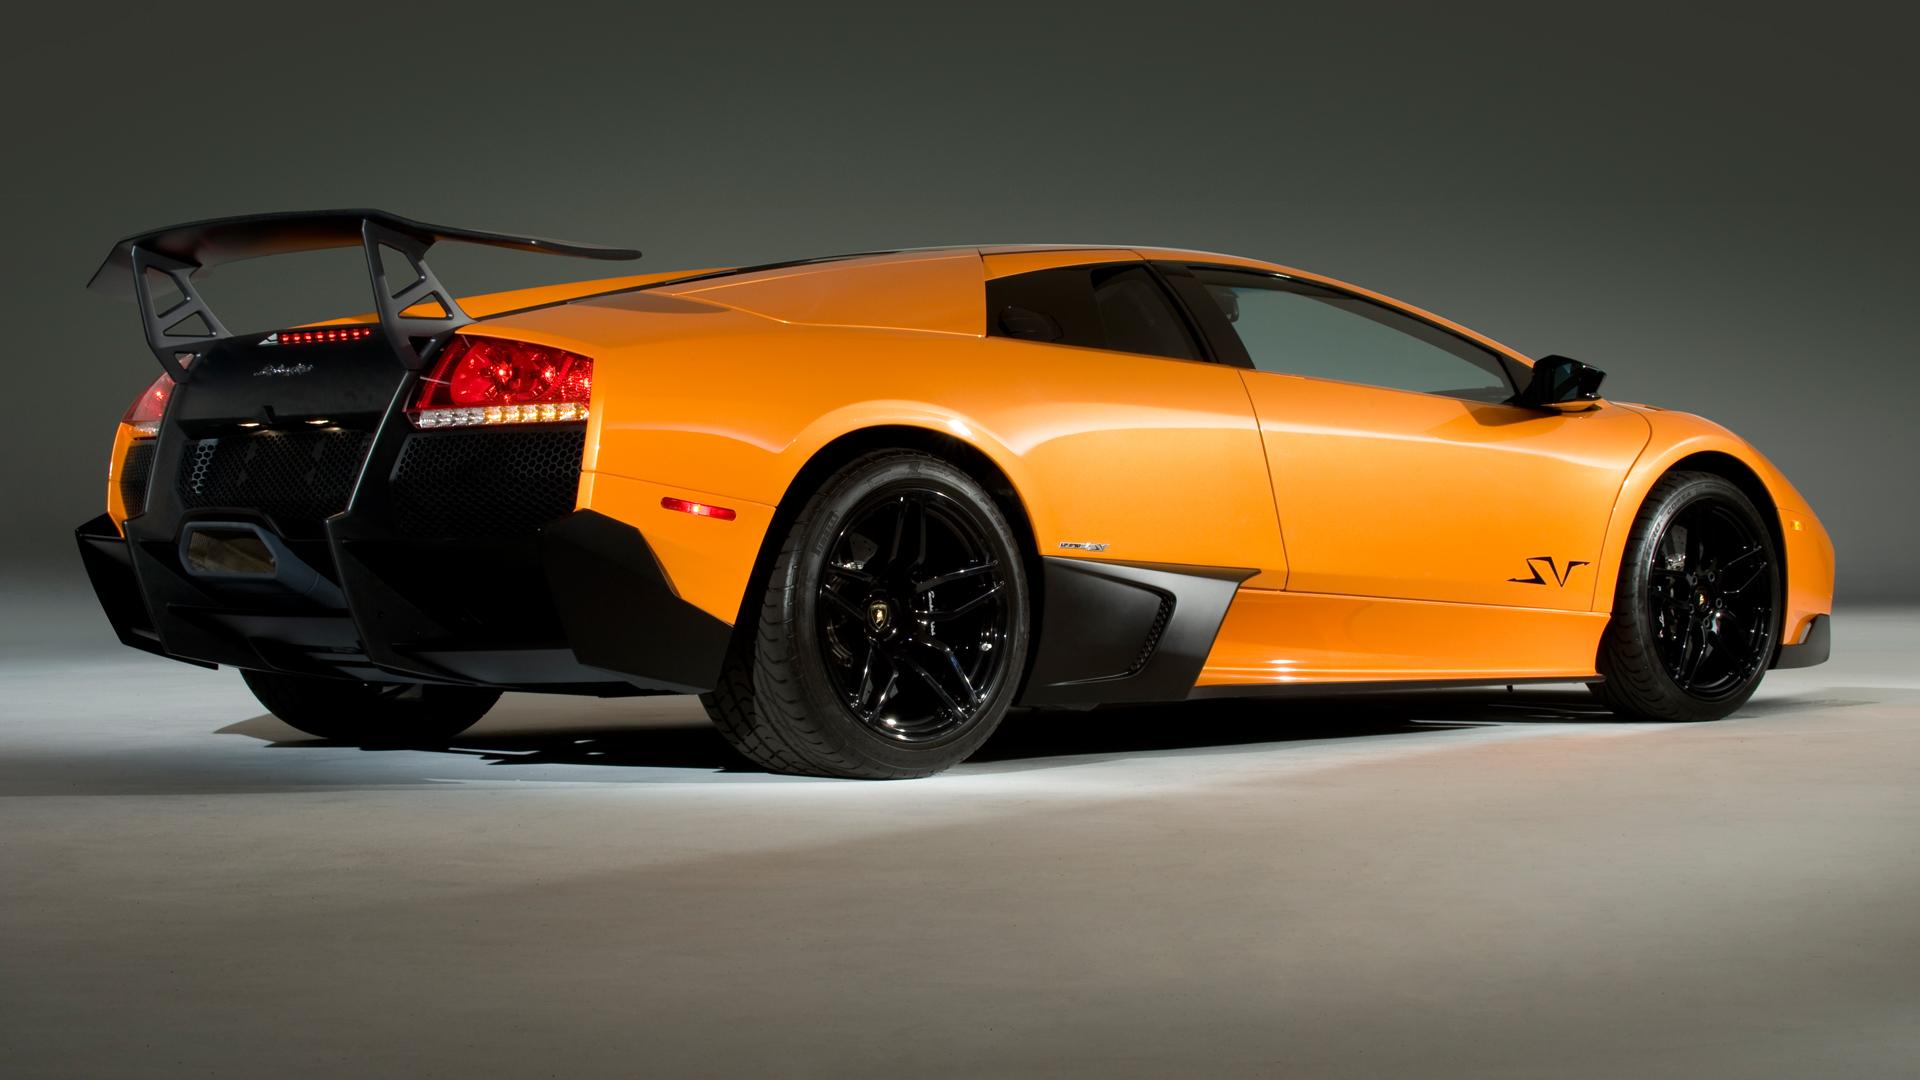 Download Lamborghini Murcielago Sv Hd Wallpaper 1920x1080 73